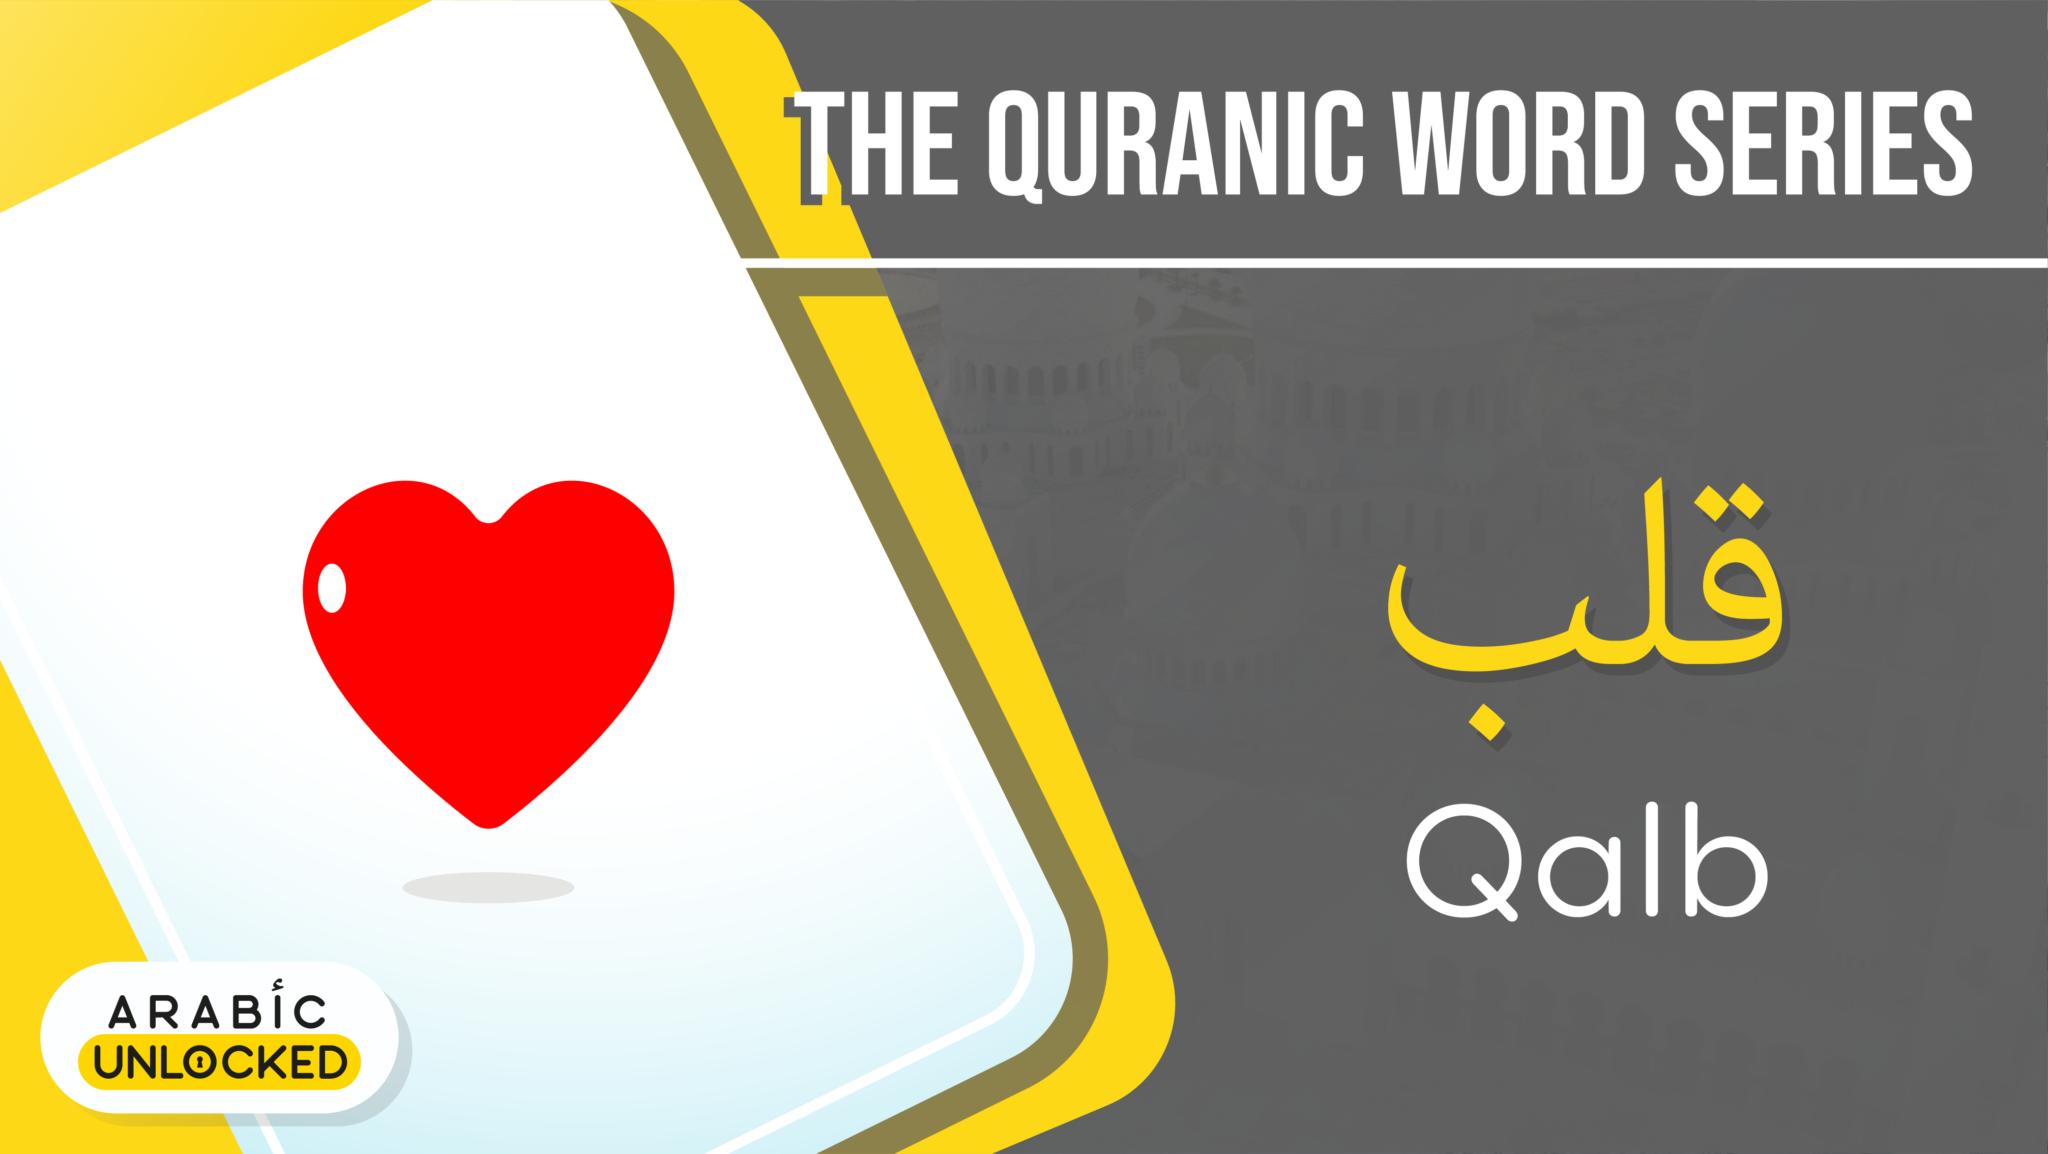 The Quranic Word Series: Qalb